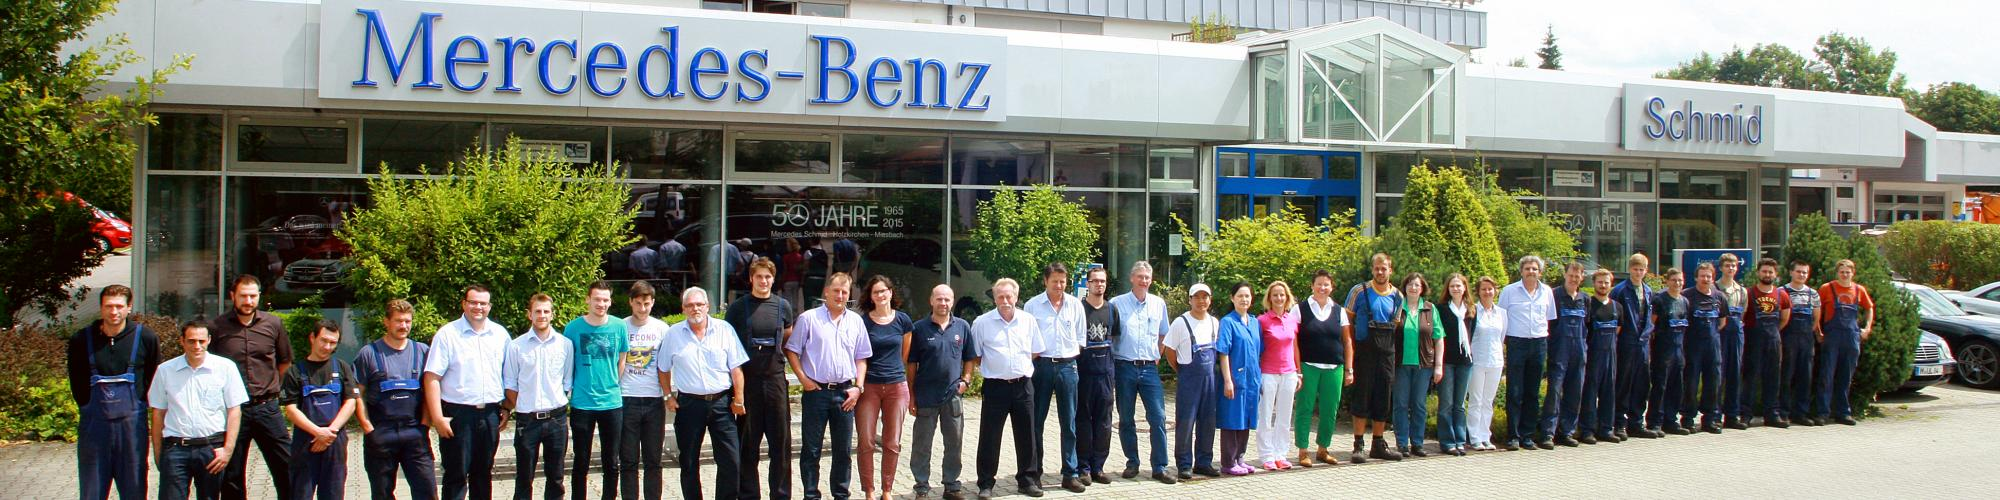 Franz Schmid GmbH & Co. KG